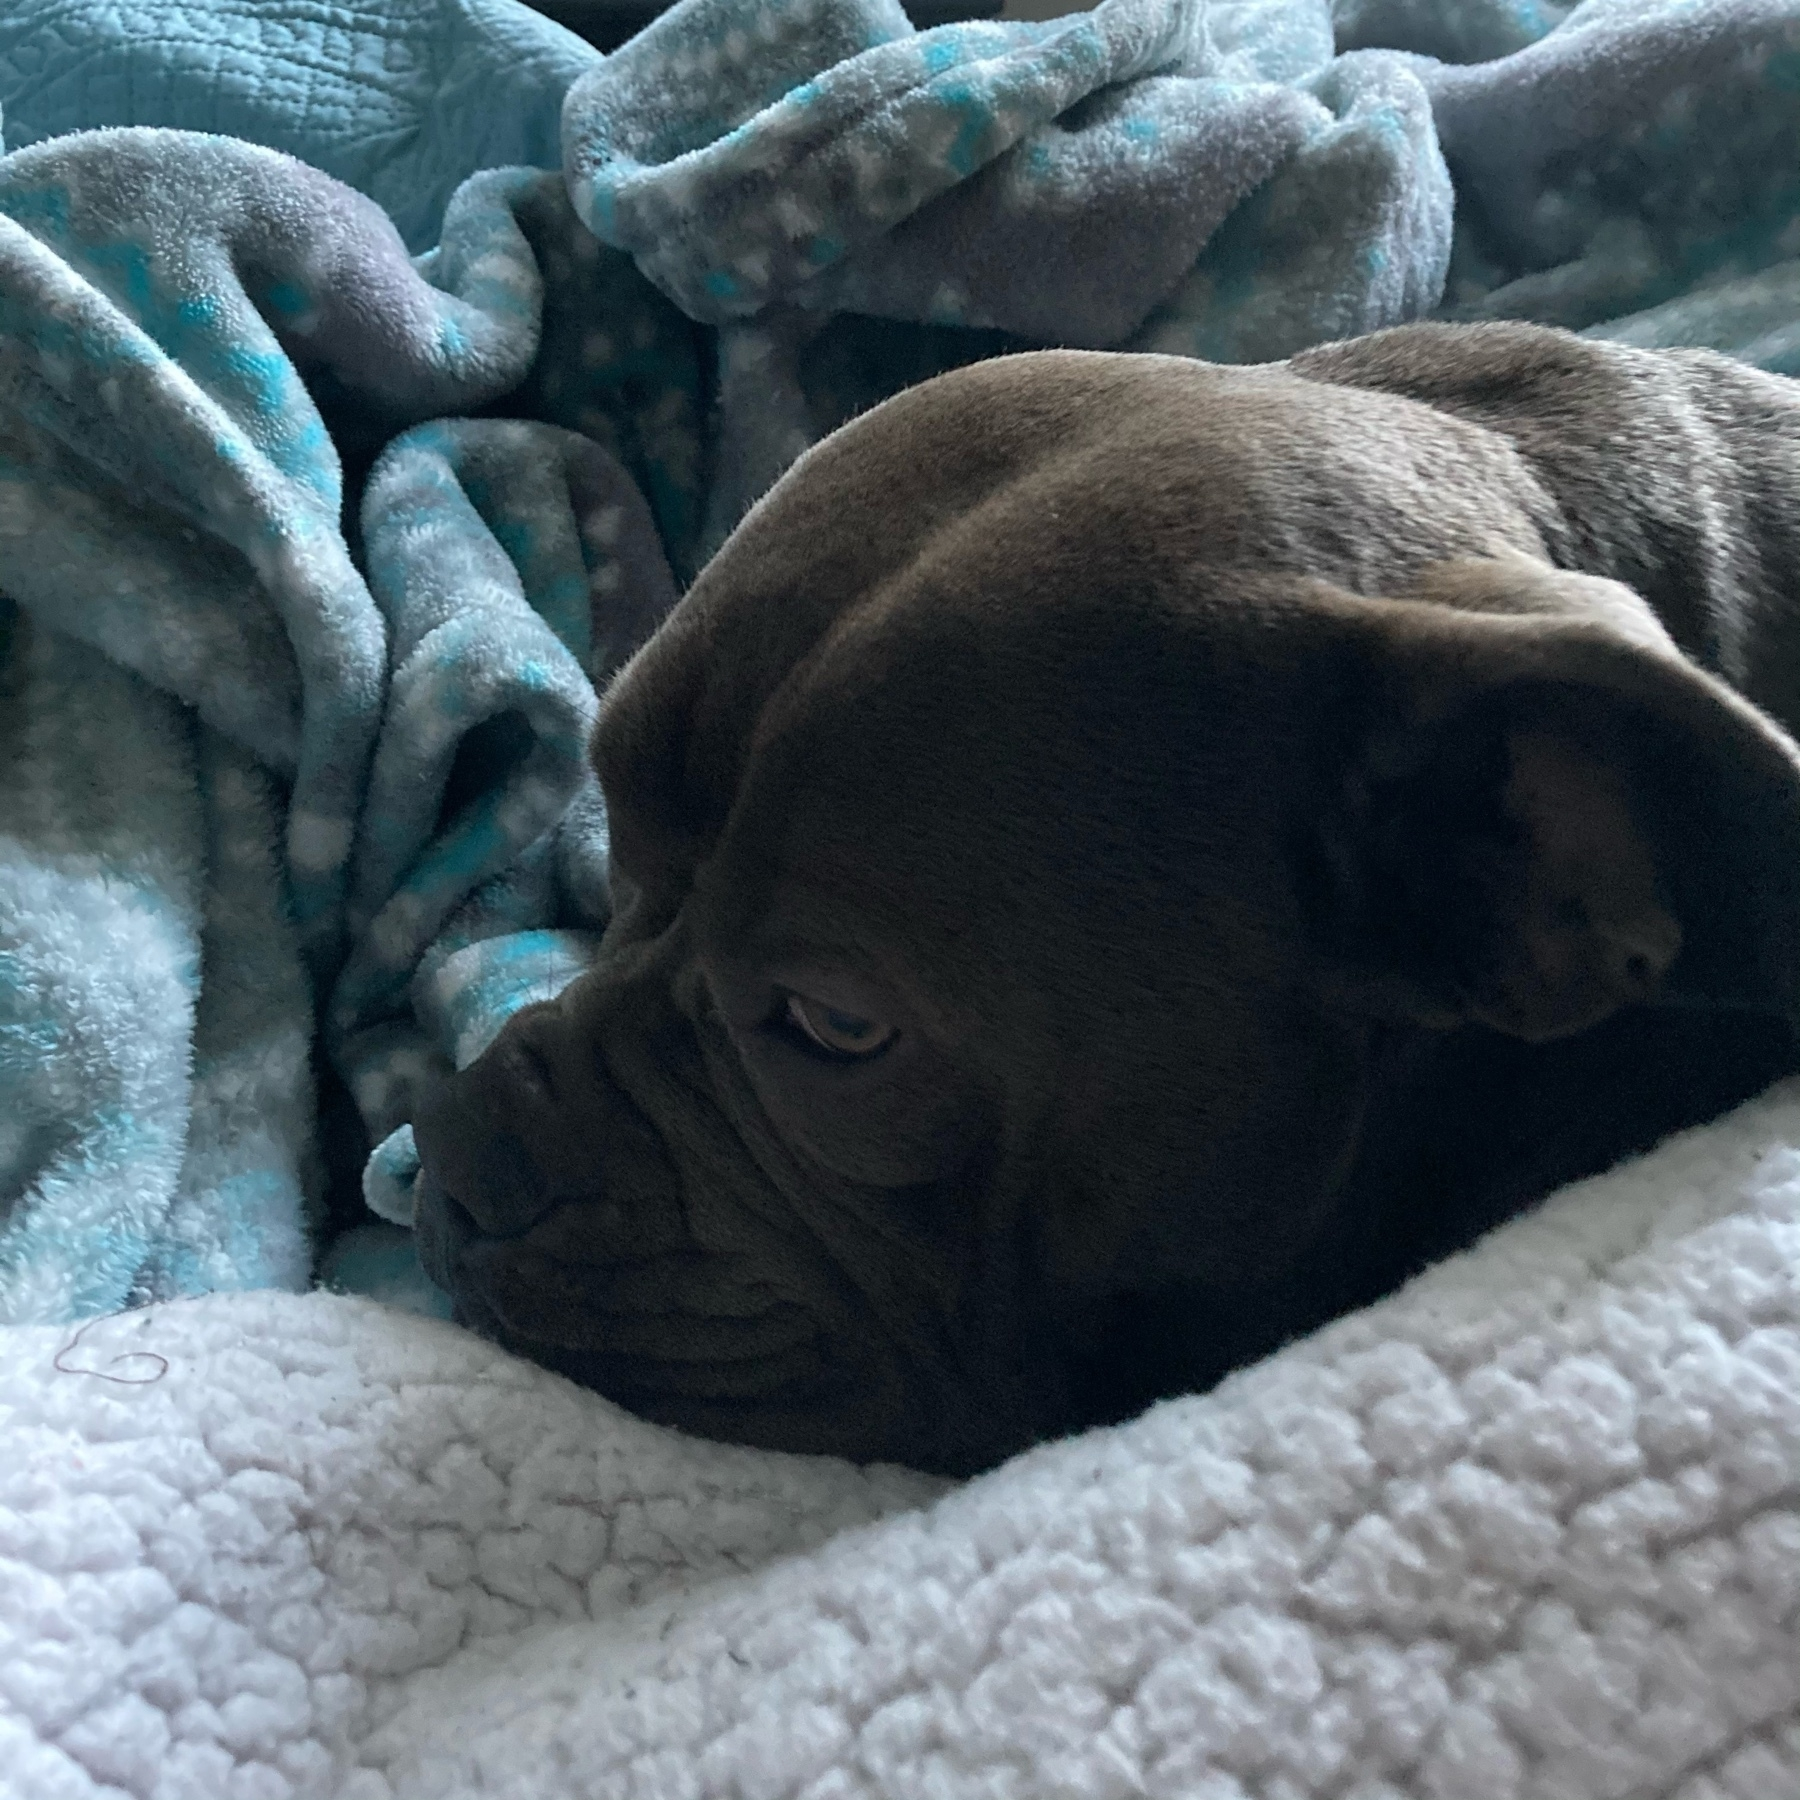 Lillie under the blankets.